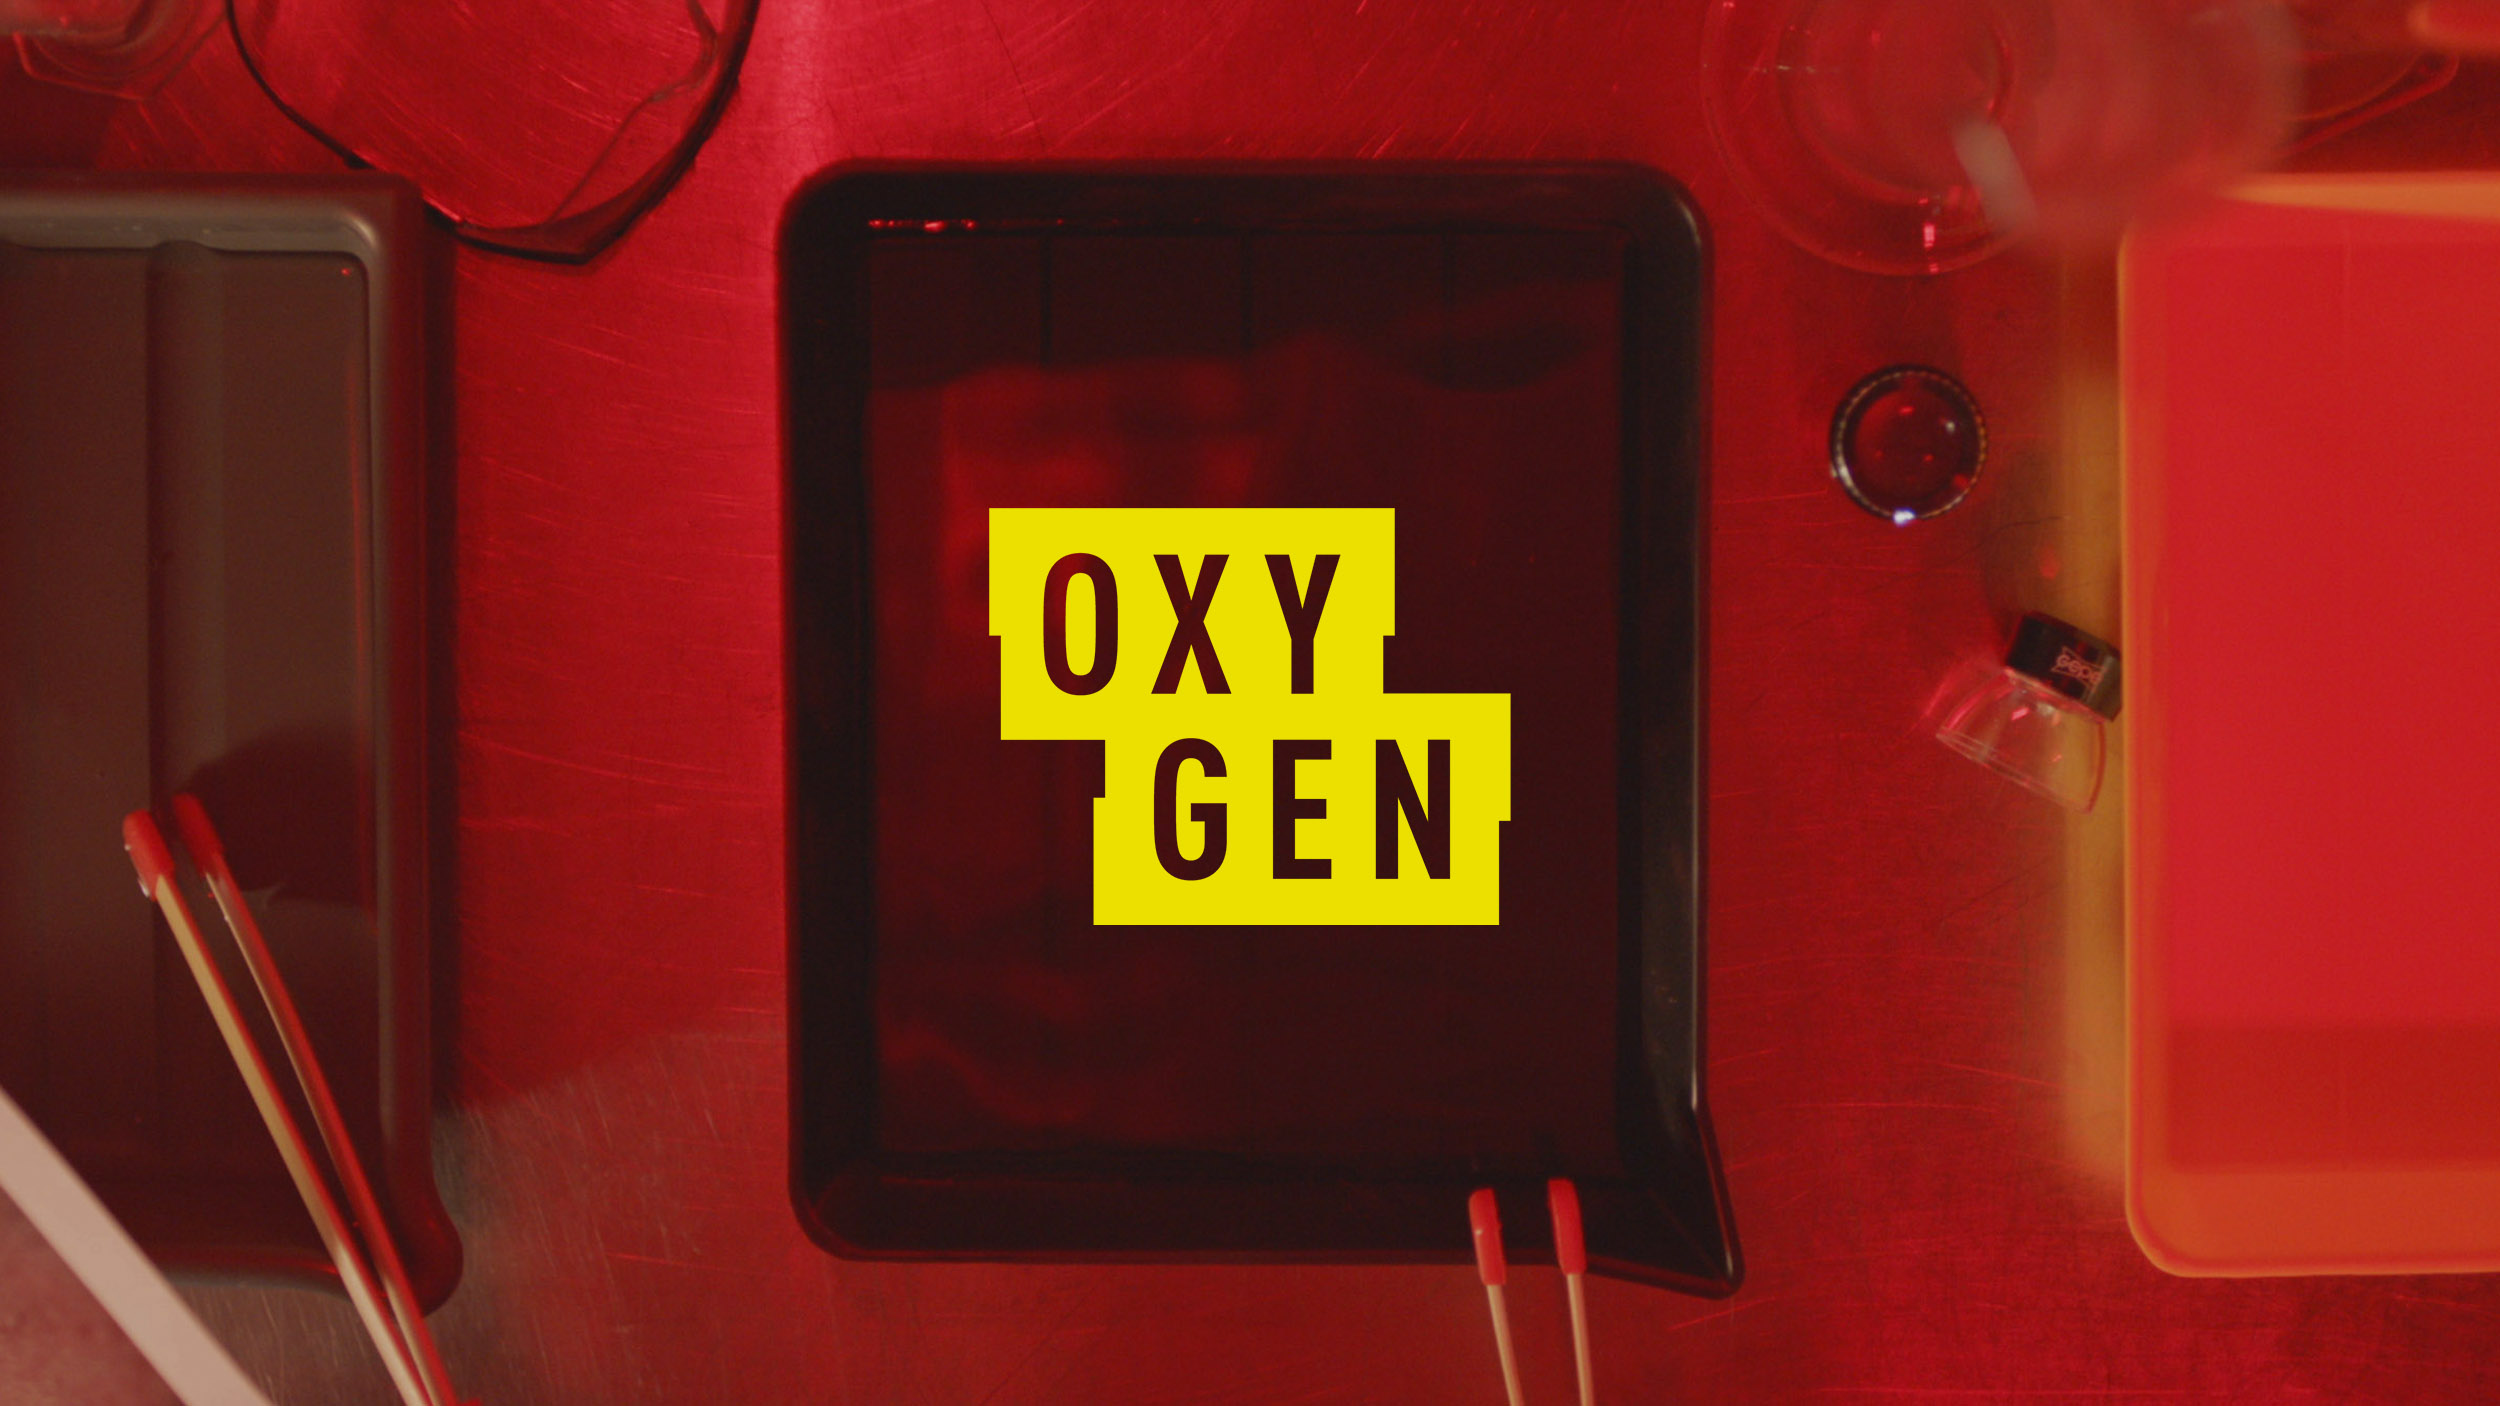 OxyDPheaderopt1.jpg